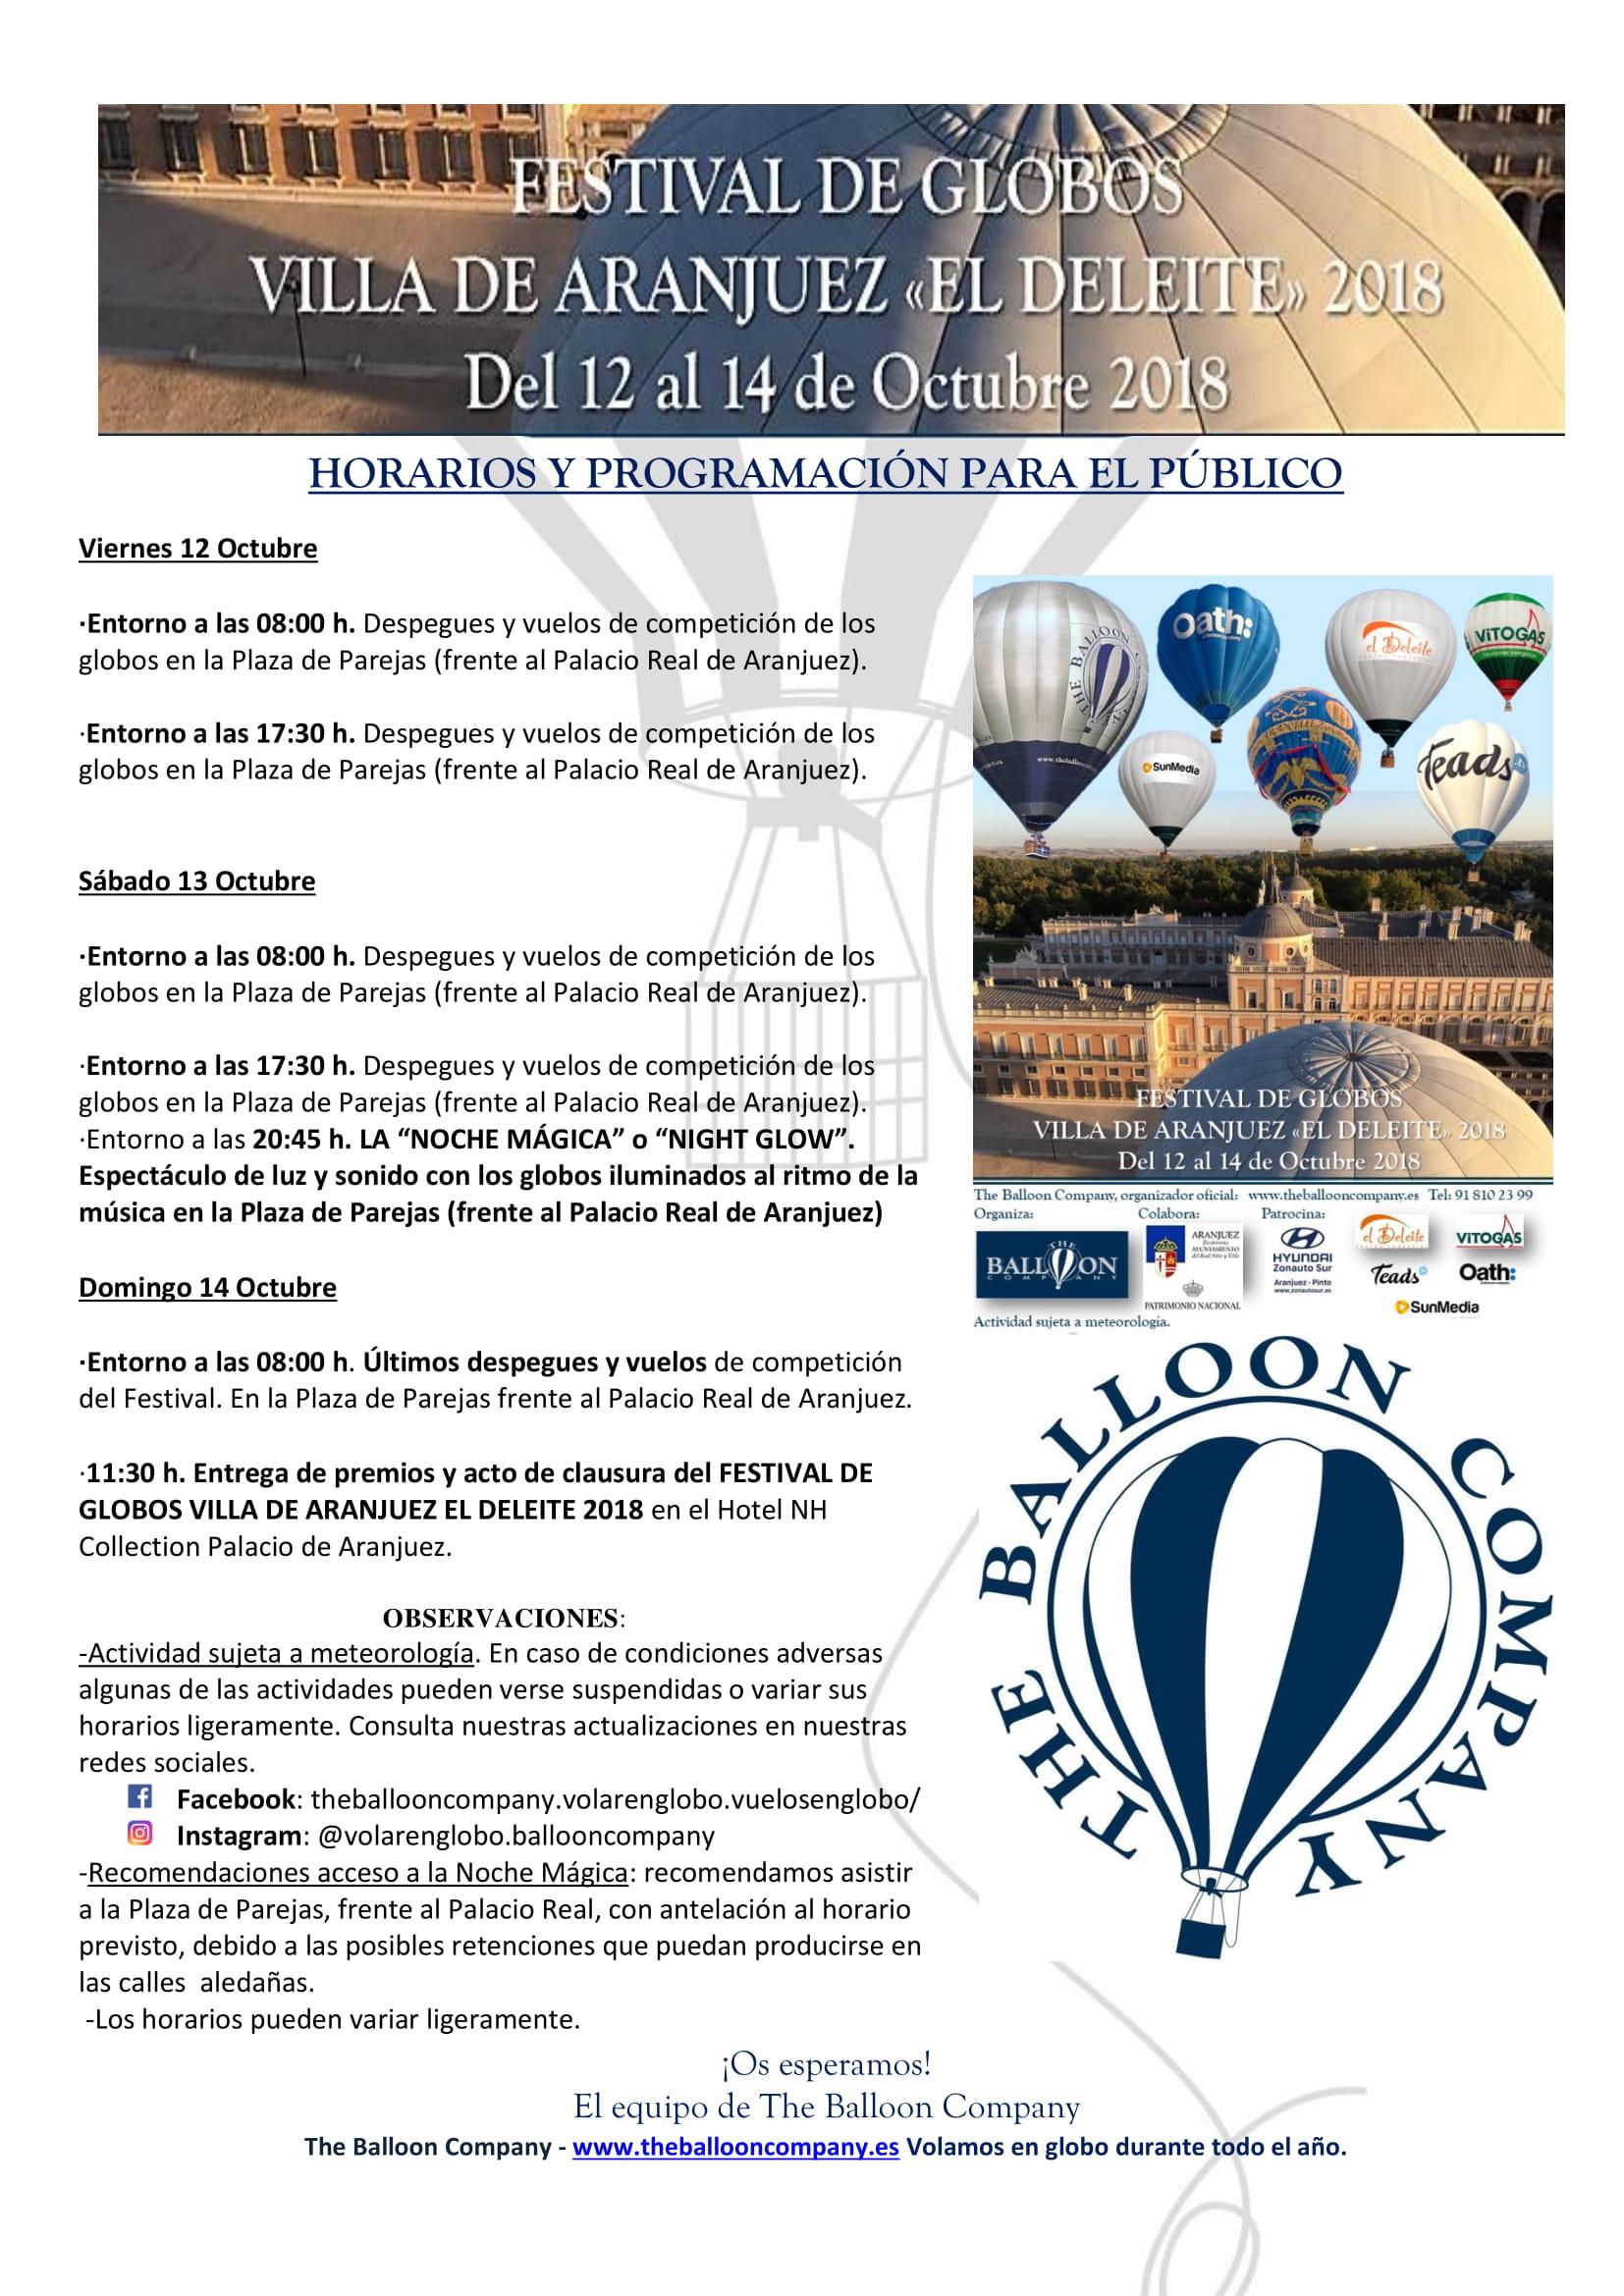 Festival de Globos Villa de Aranjuez El Deleite – THE BALLOON COMPANY